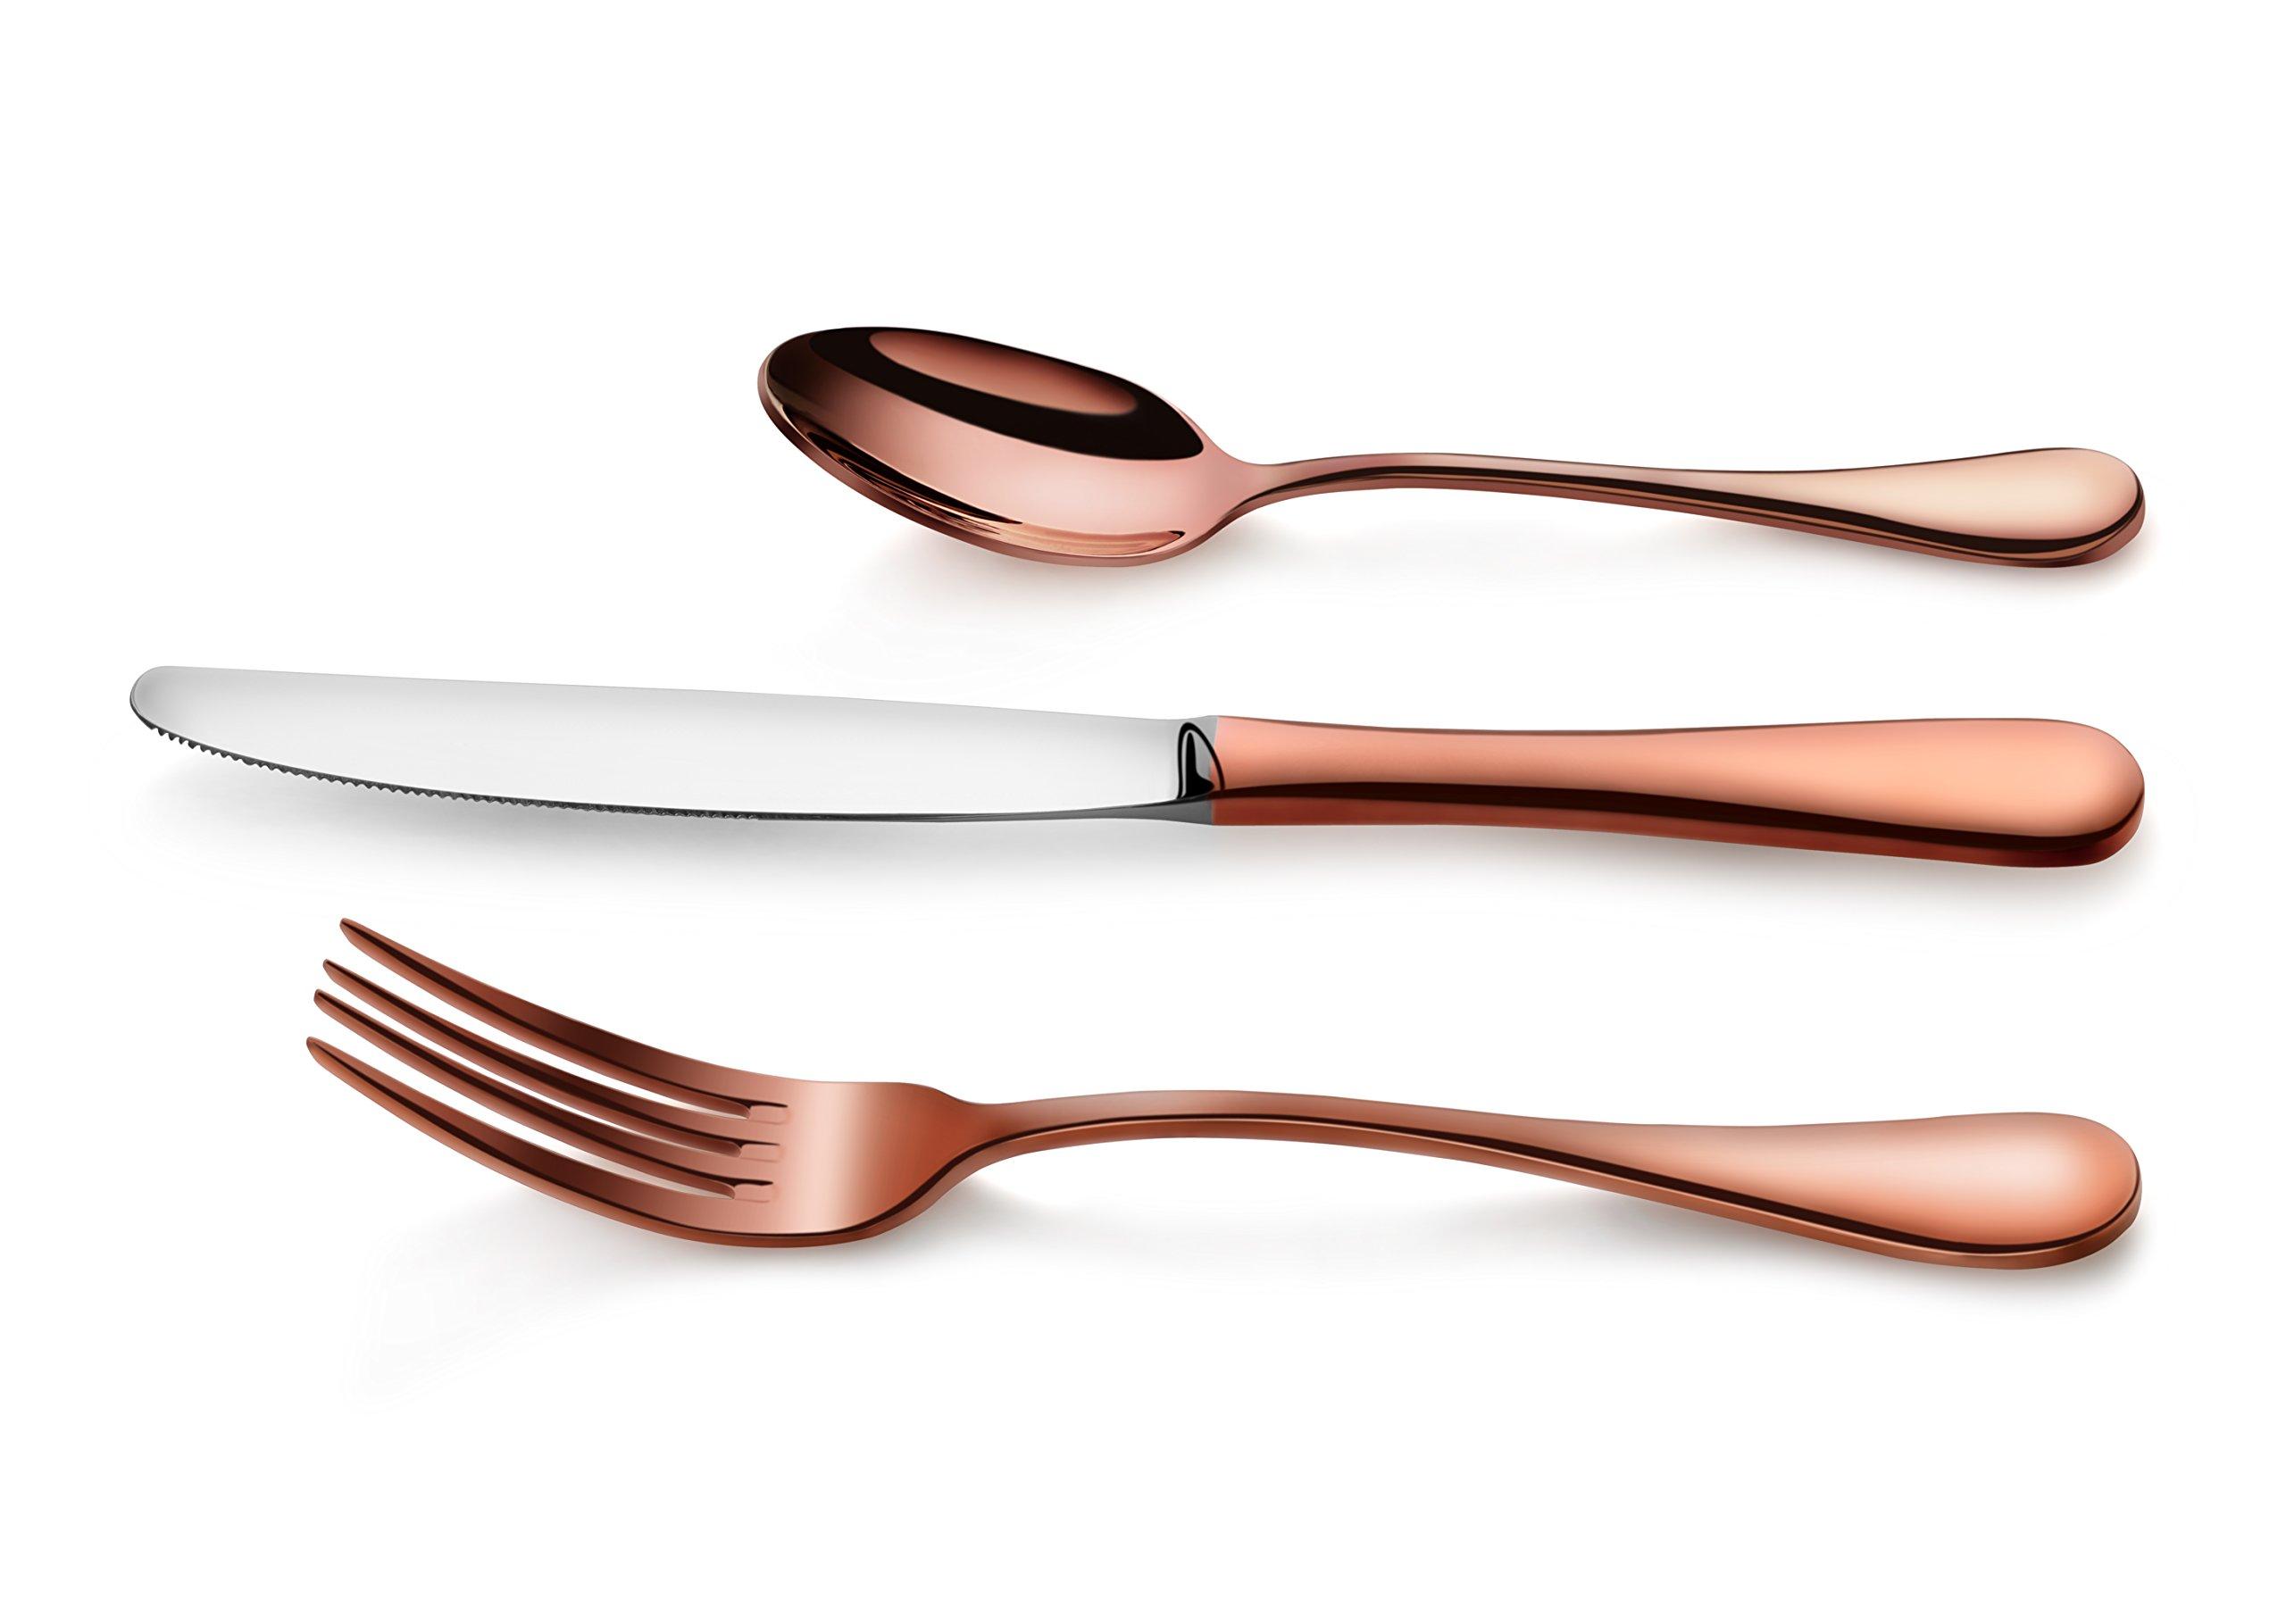 Artaste 56419 Rain 18/10 Stainless Steel Flatware 36 Piece Set, Antique Copper Finished, Service for 12 by Artaste (Image #6)